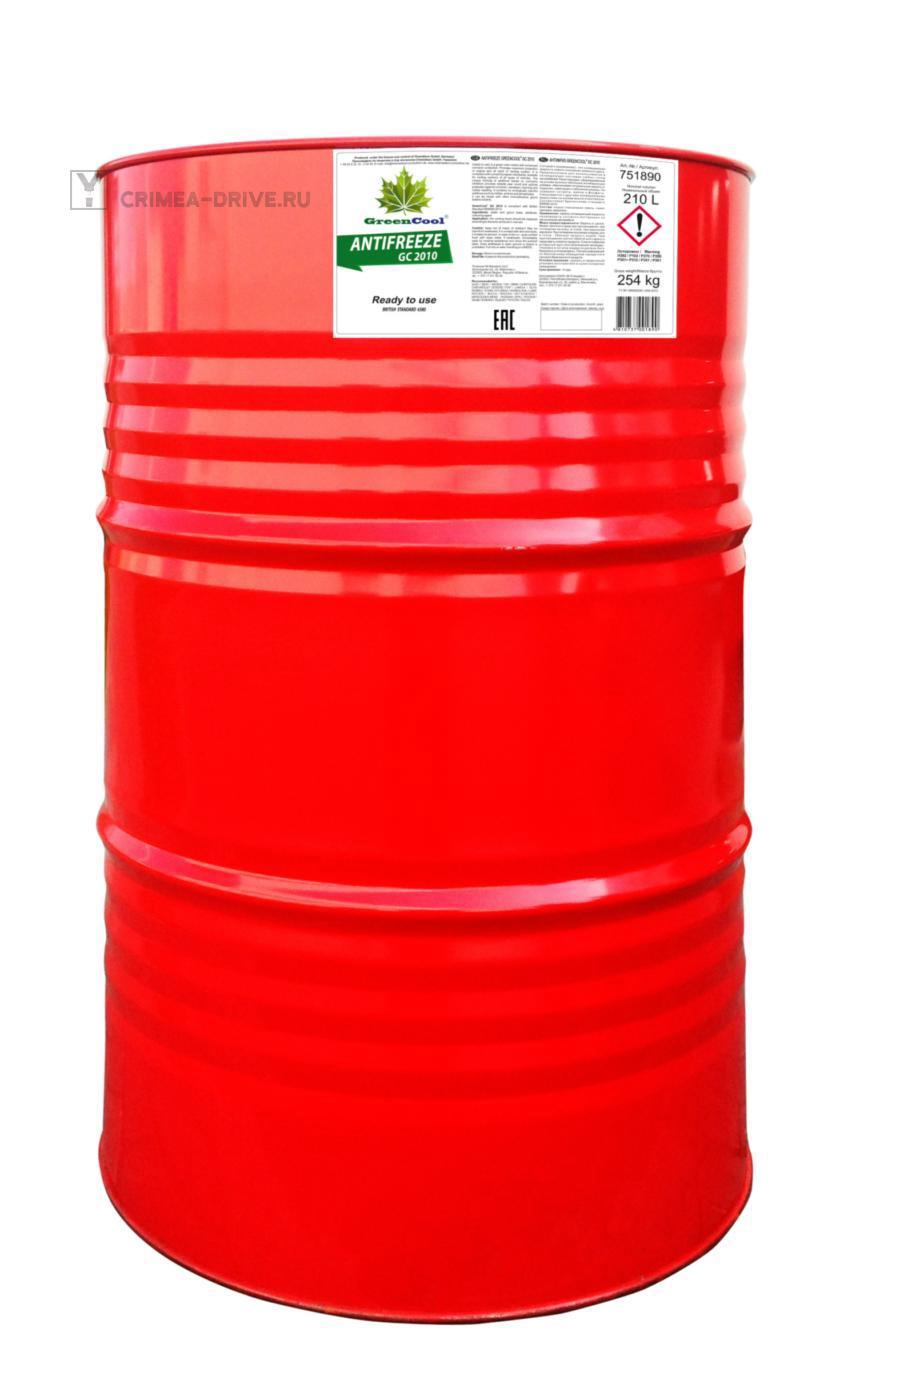 Антифриз GС2010 G11, 210 л (готовый/ready to use), зеленый